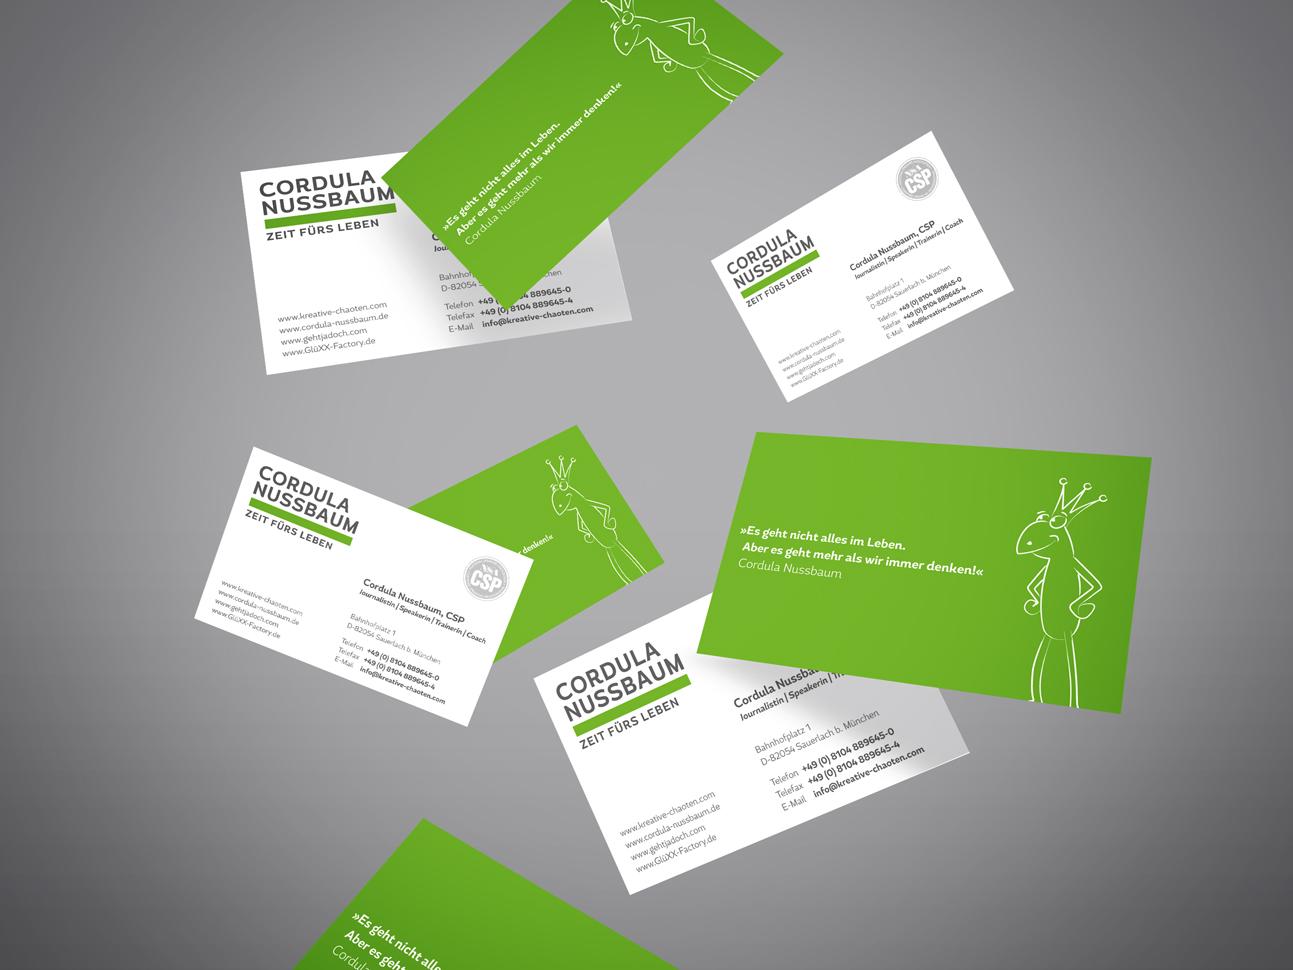 martin_zech_design_corporate_design_cordula_nussbaum_visitenkarte